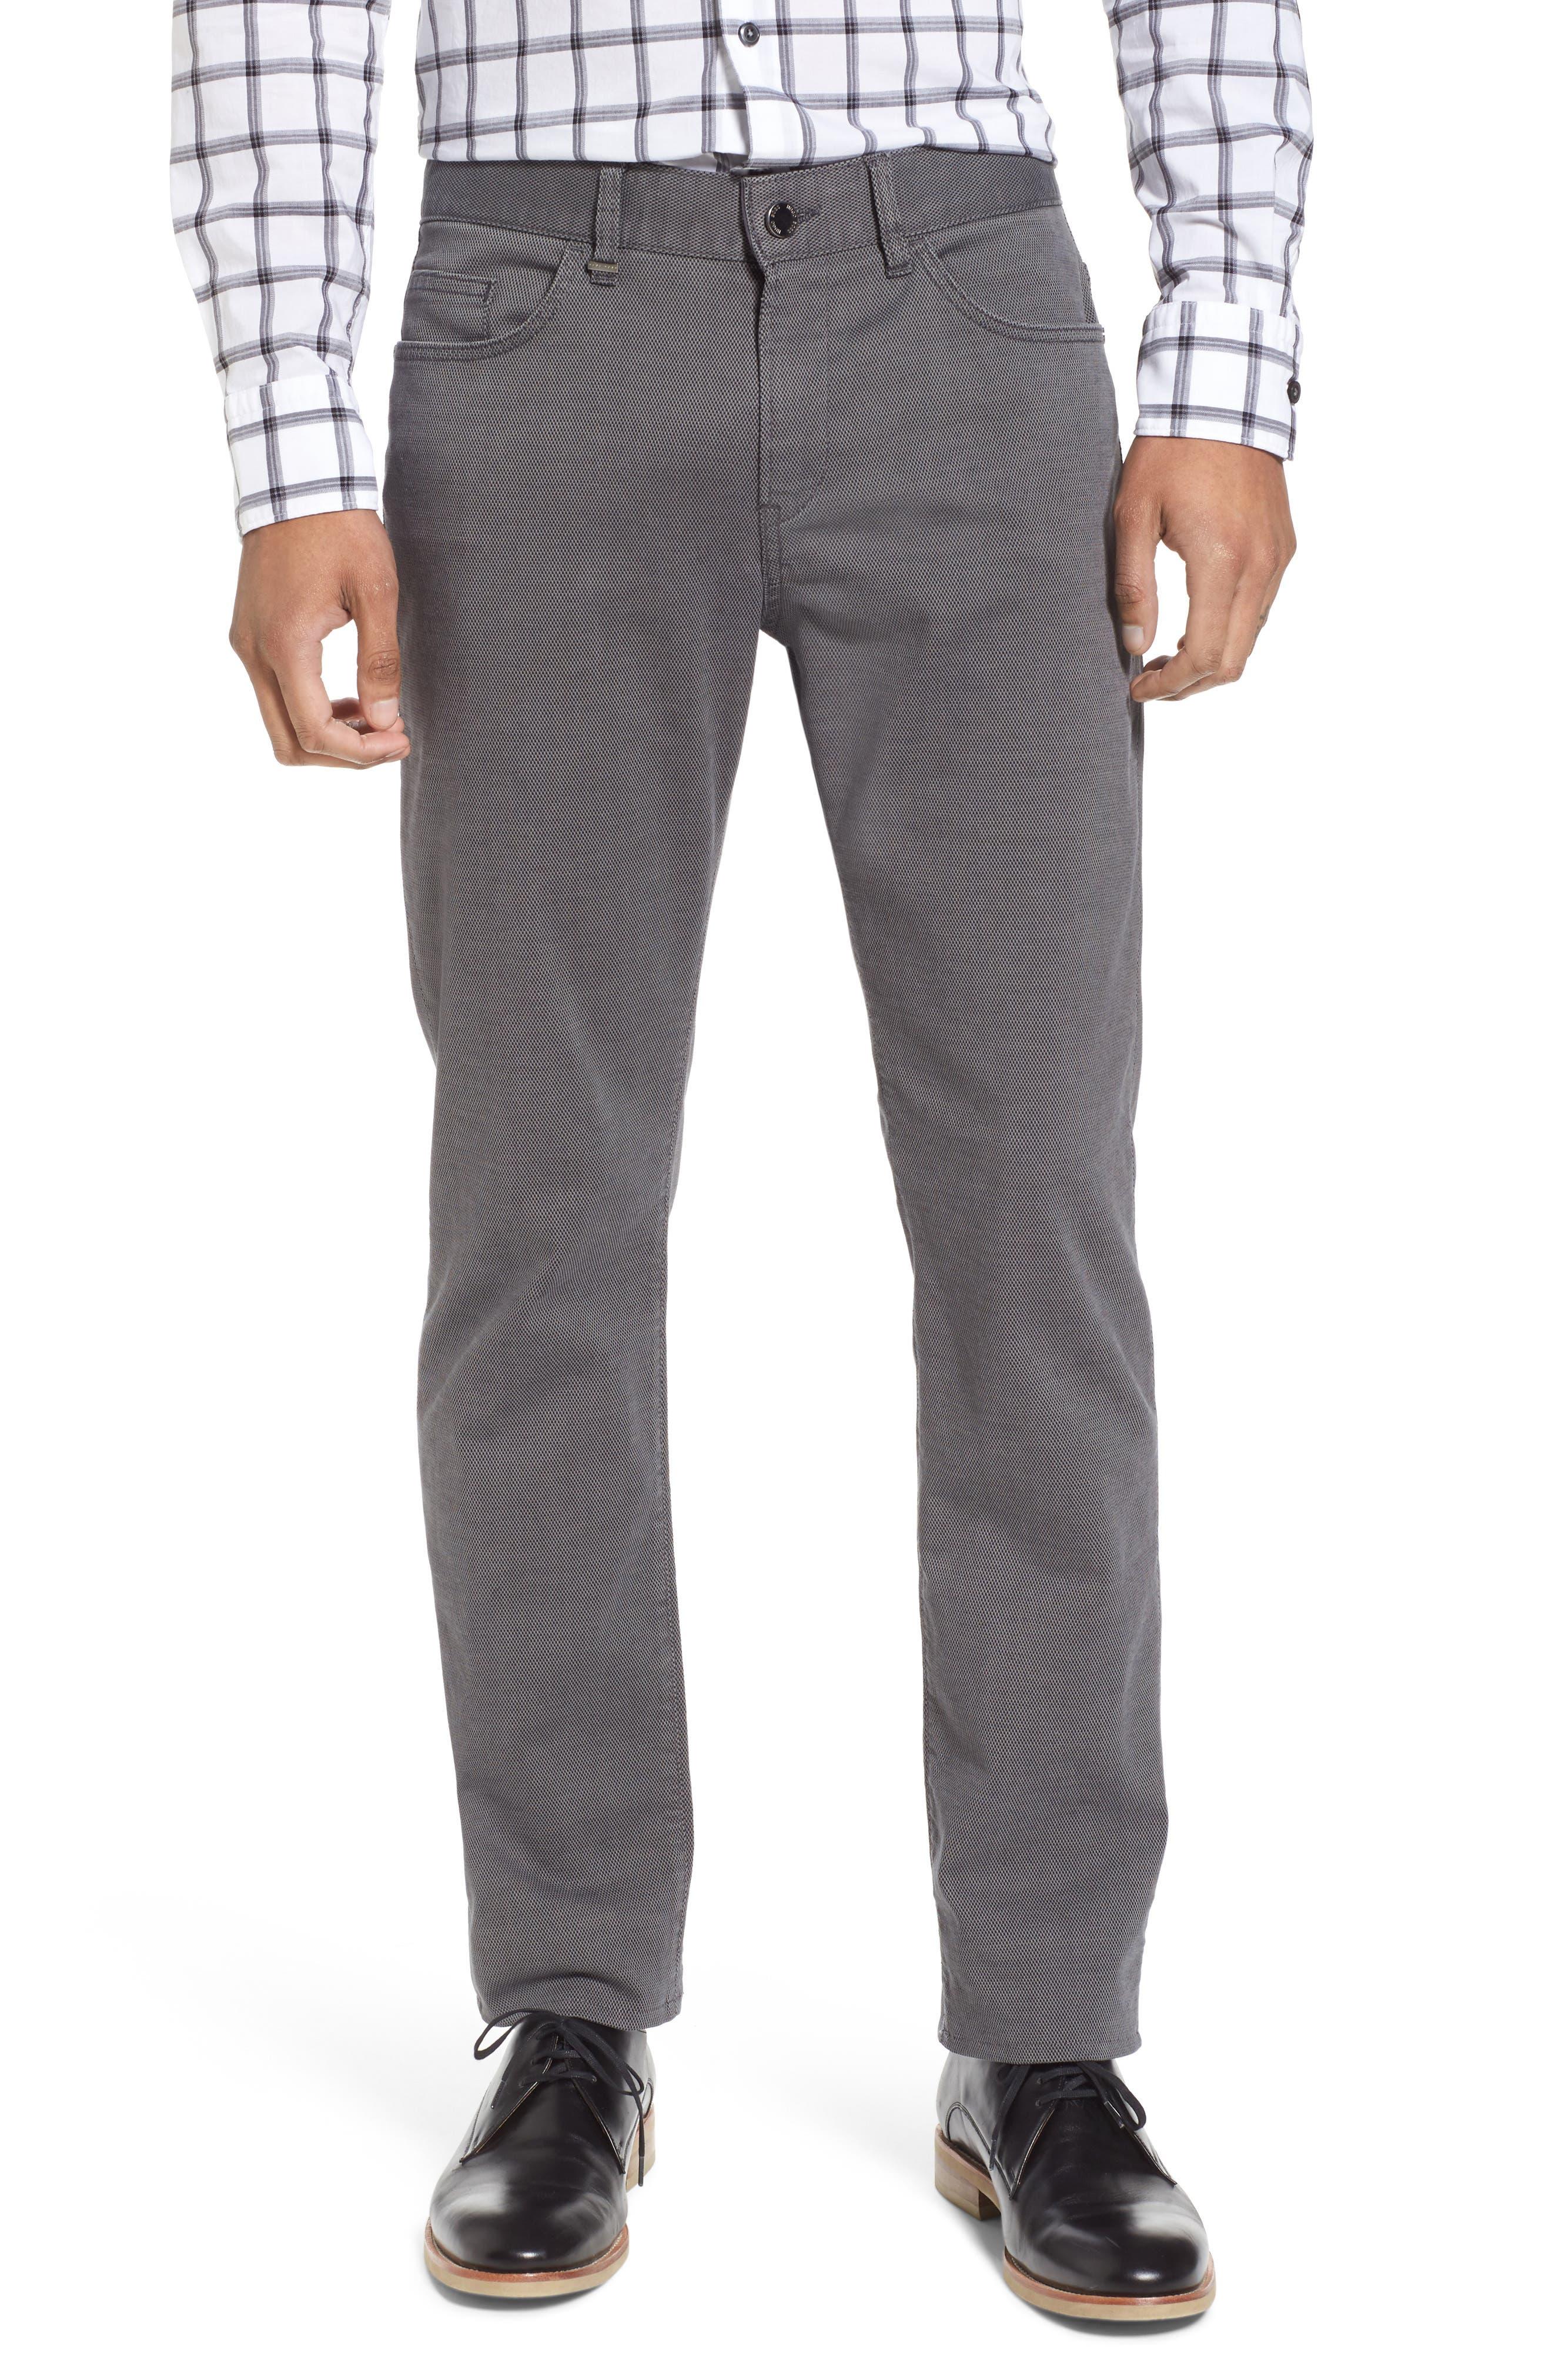 Delaware Slim Fit Structure Jeans,                             Main thumbnail 1, color,                             Grey